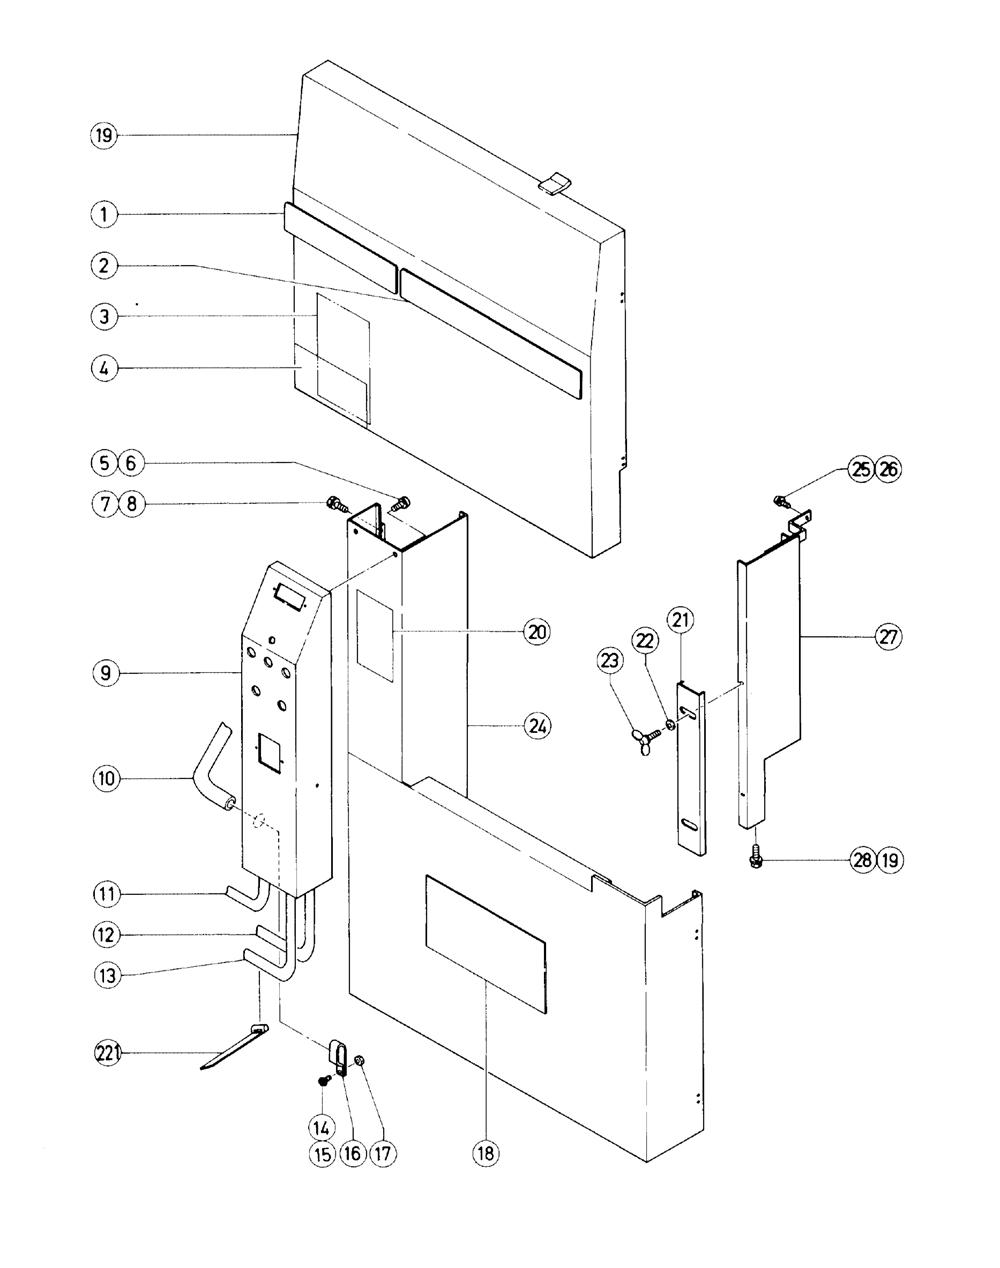 Hitachi Cb100fa Parts List Repair Oem Washing Machine Wiring Diagram Schematic